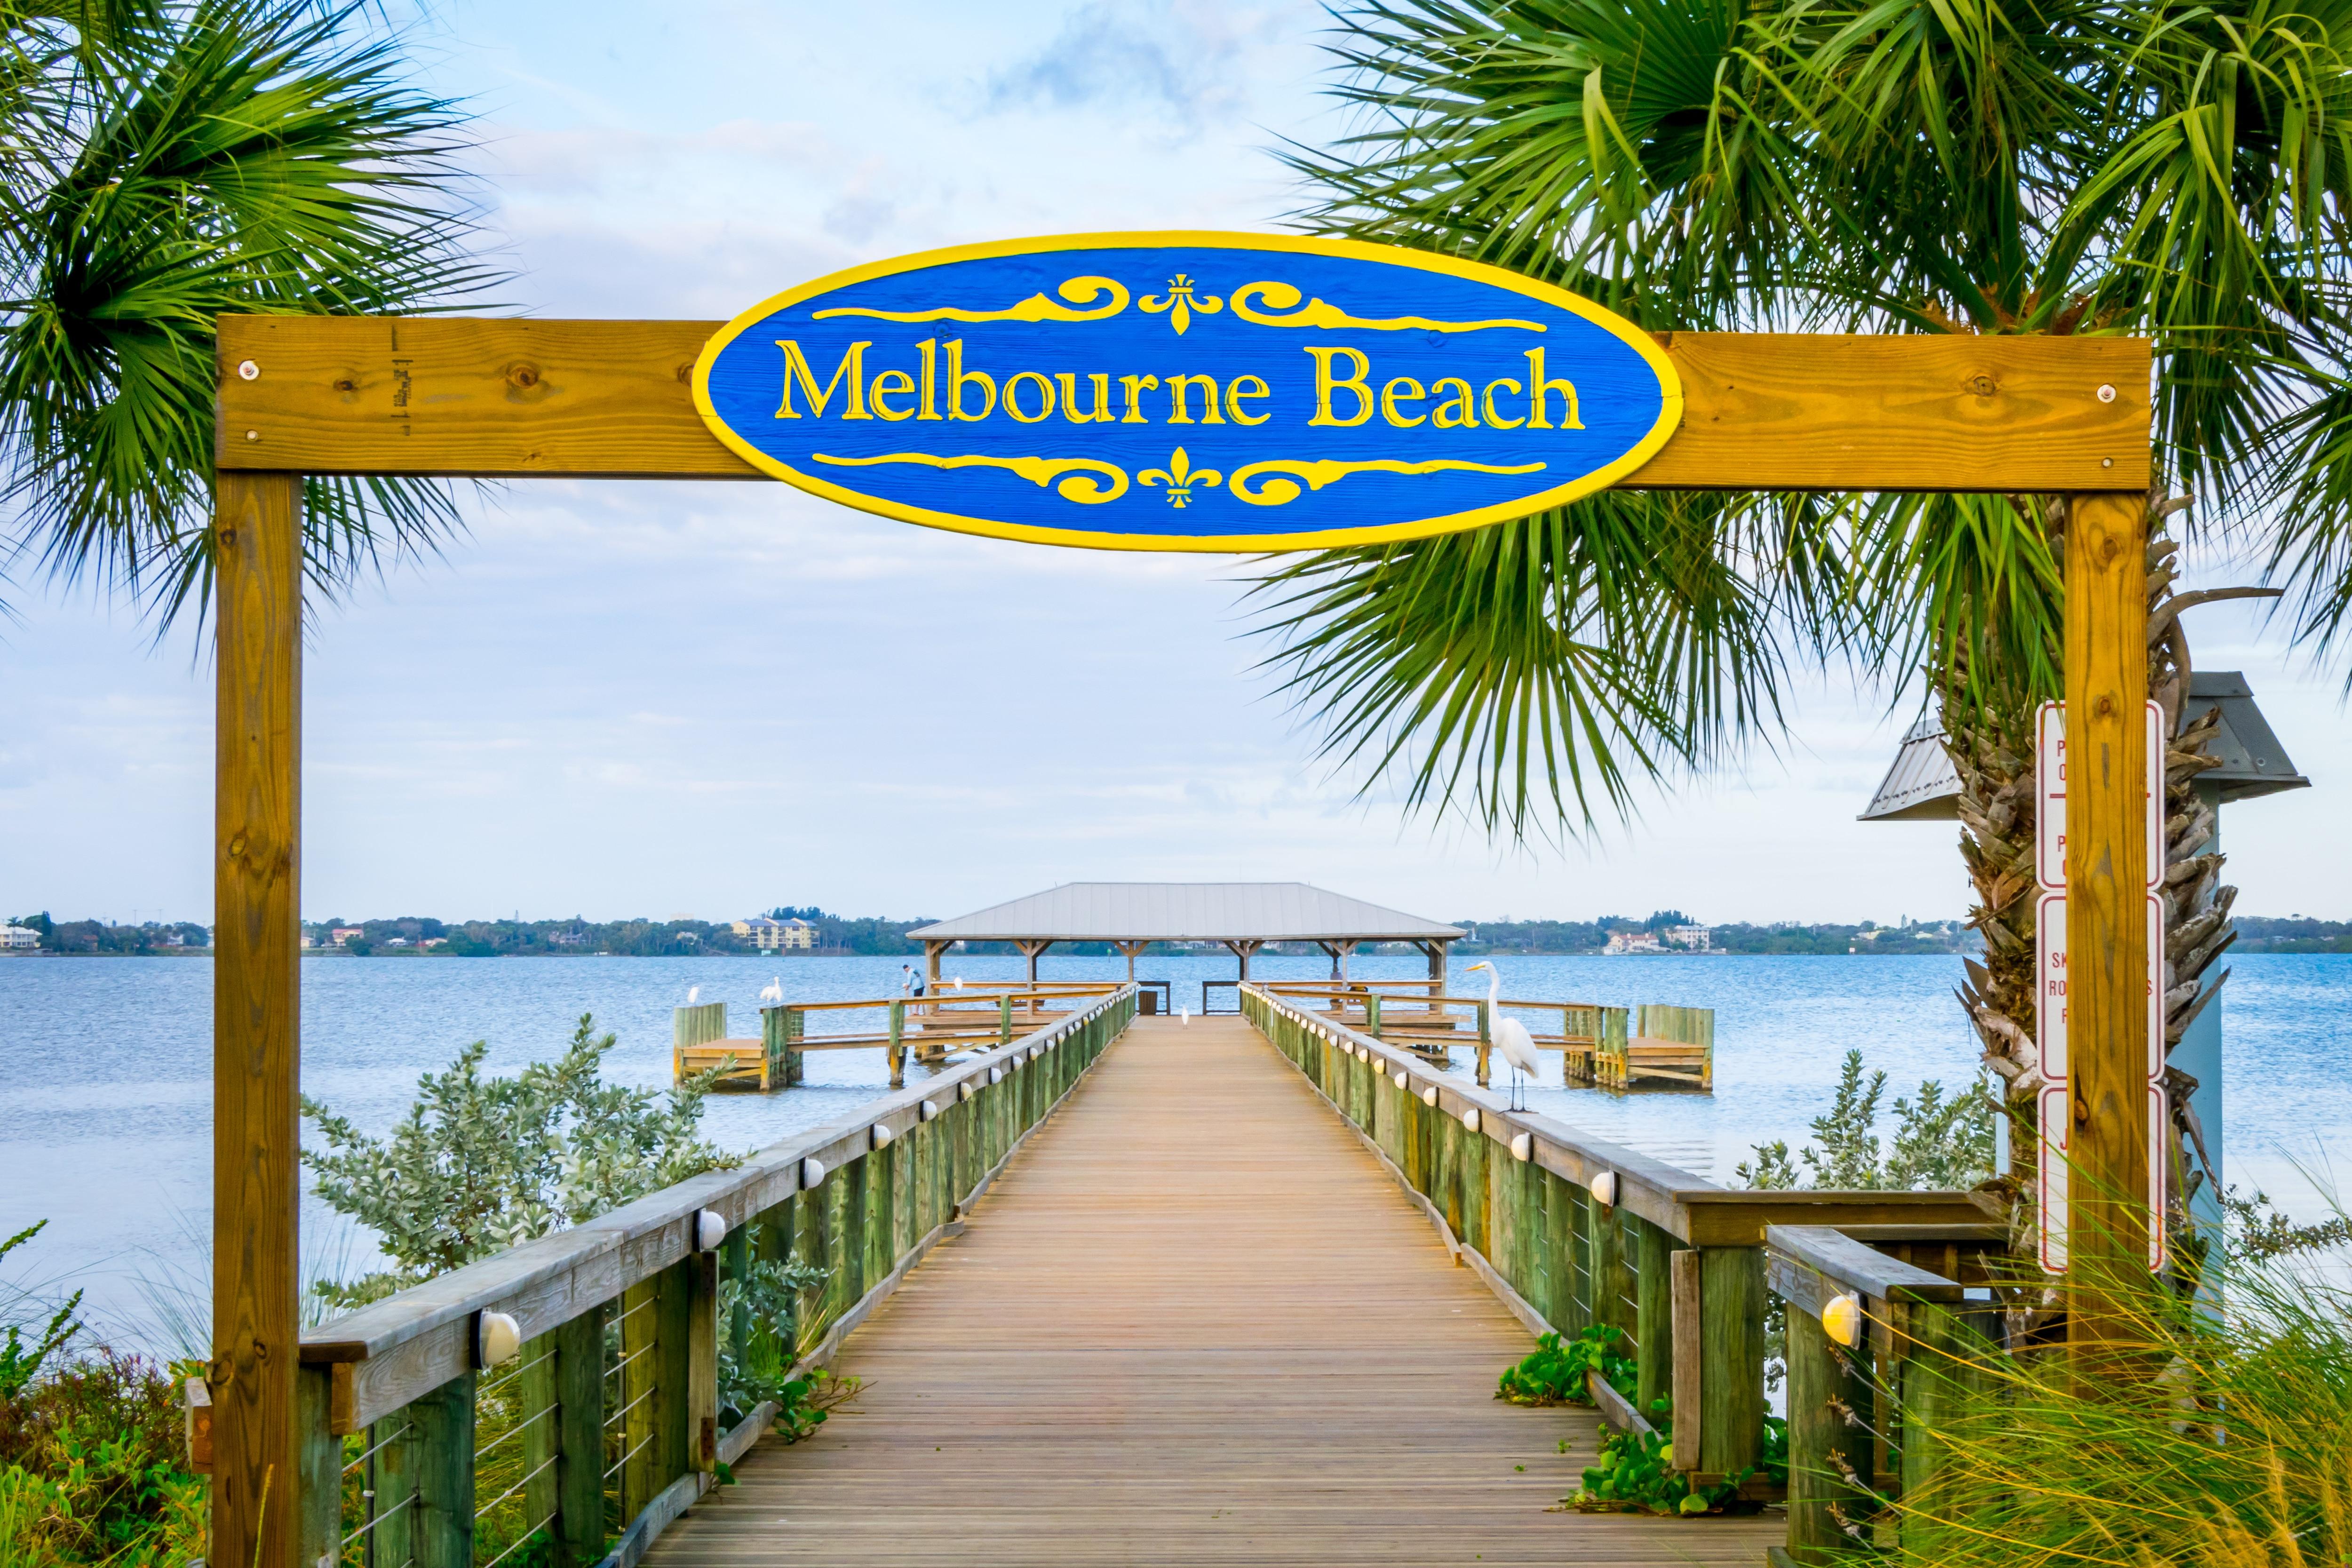 Melbourne Beach sign and pier in Melbourne Beach, Florida.